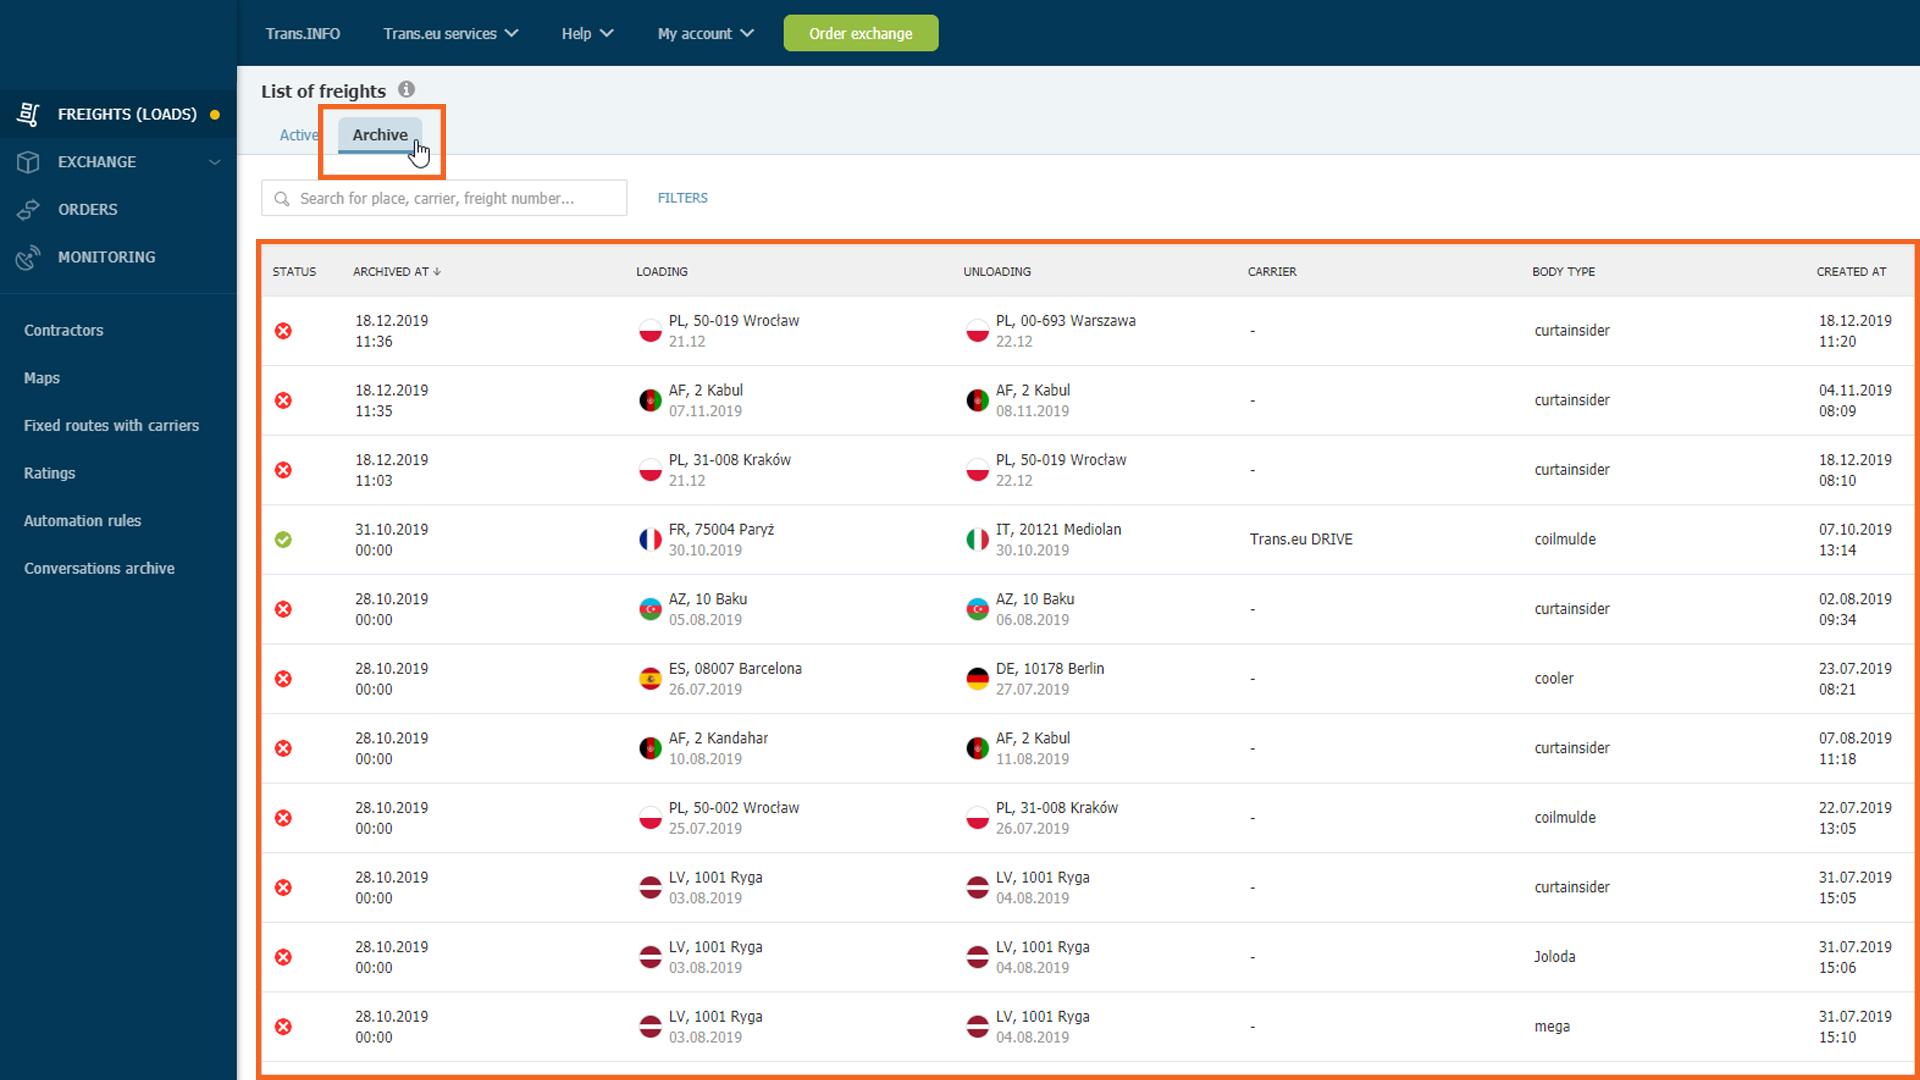 Archive tab on the Trans.eu Platform